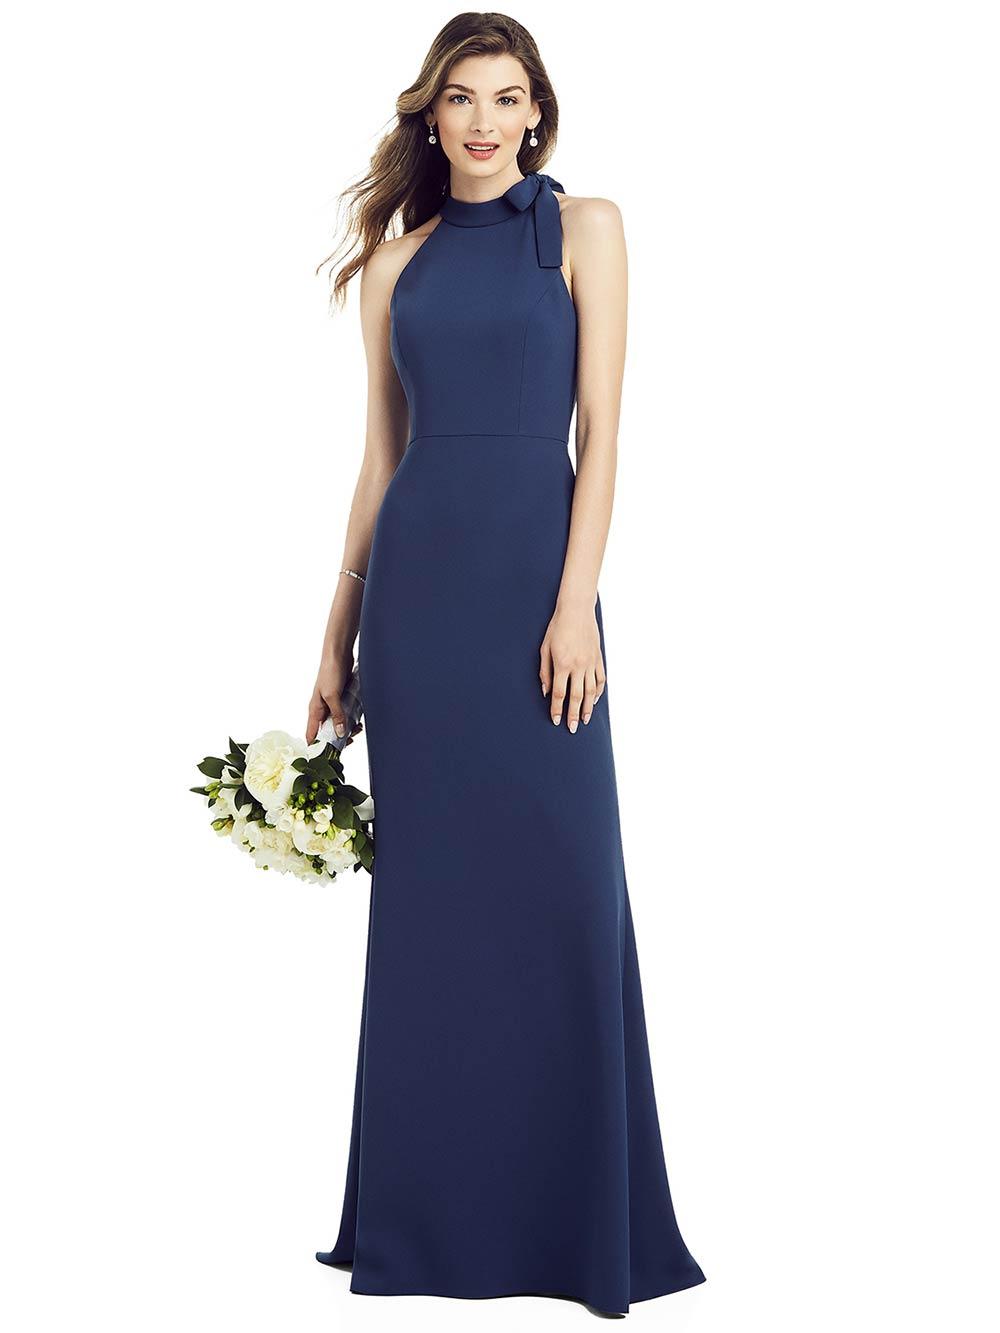 bridesmaid-dresses-dessy-28027